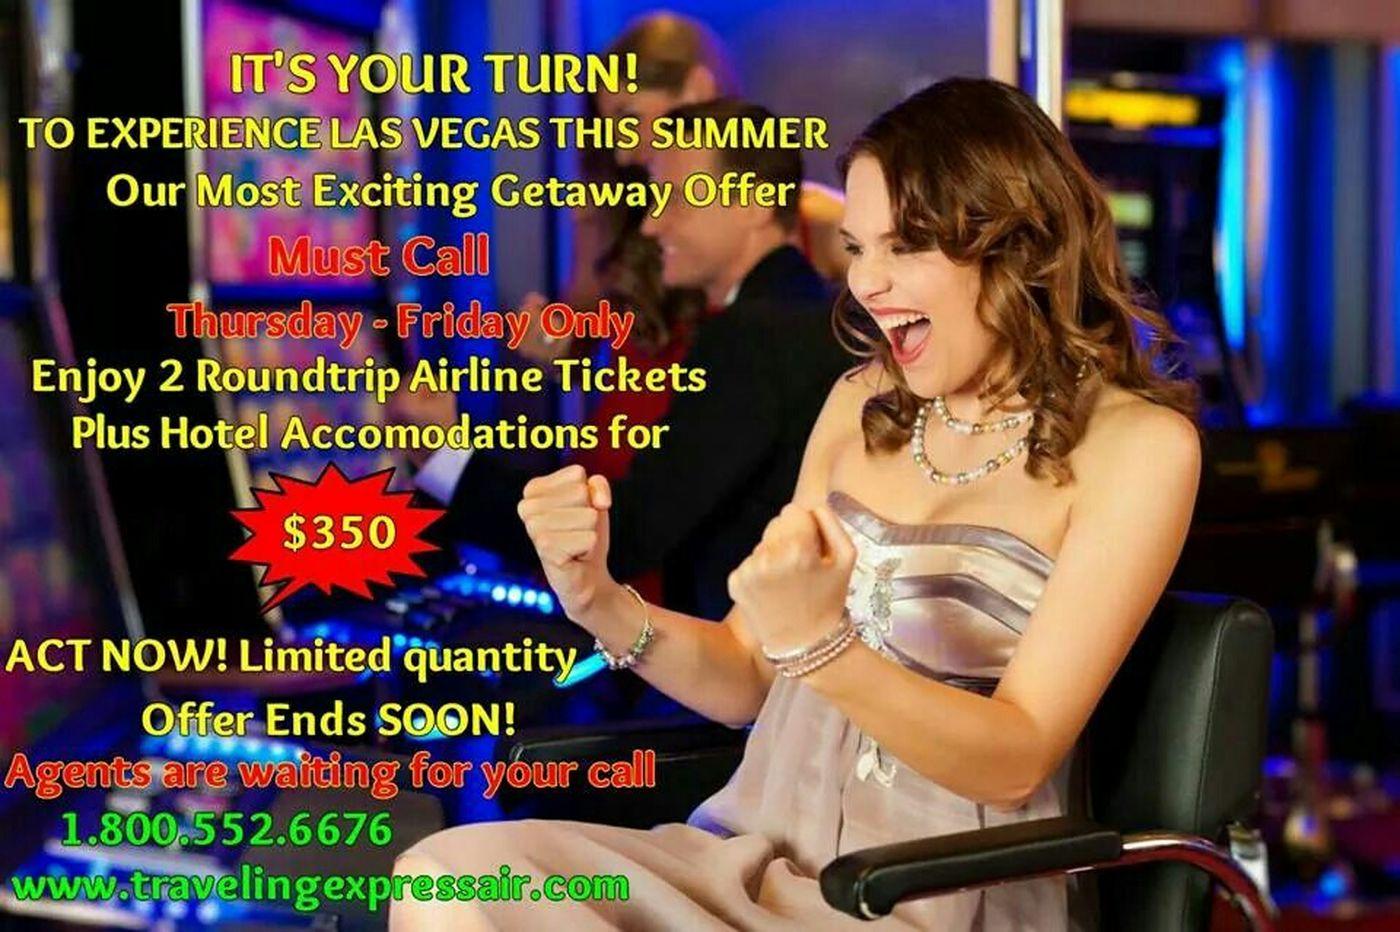 Traveling Travelingexpressair Travel Affordable Price Visa Summer Vacation Vacation2015 Lasvegas LASVAGAS Lasvegasroll